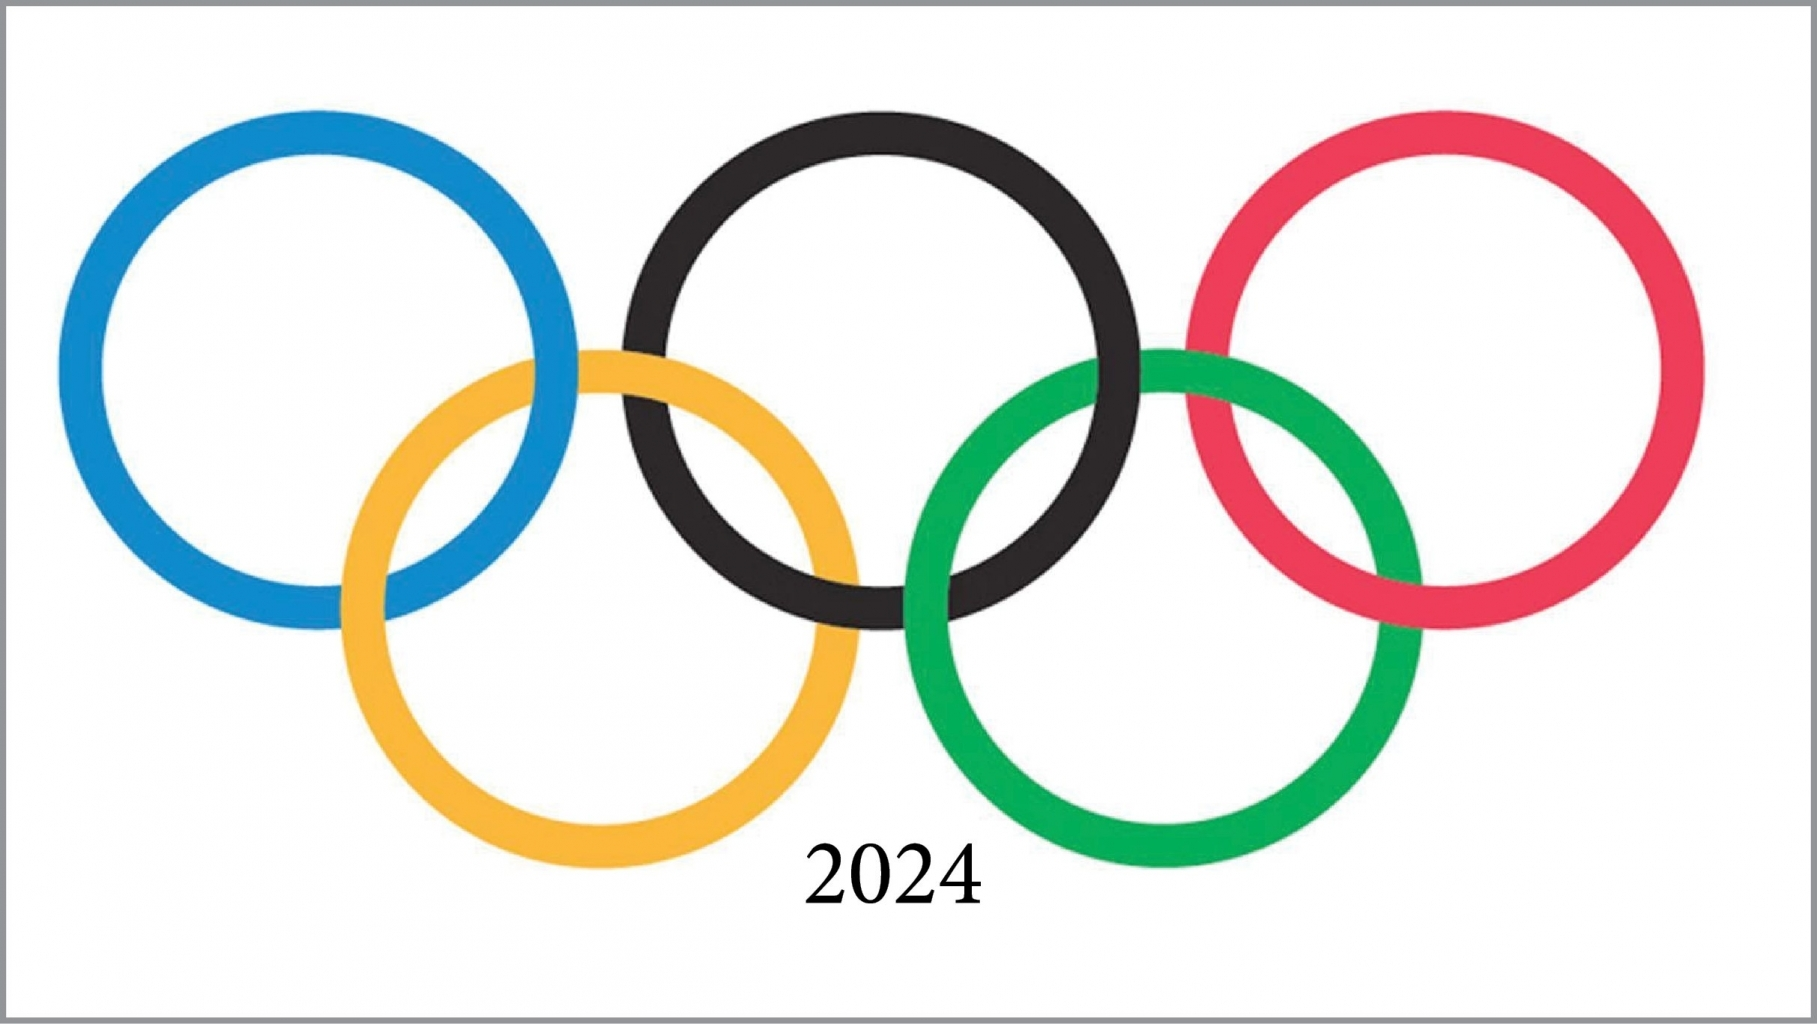 Olimpiadi 2014, Firenze pronta a sostituire Roma